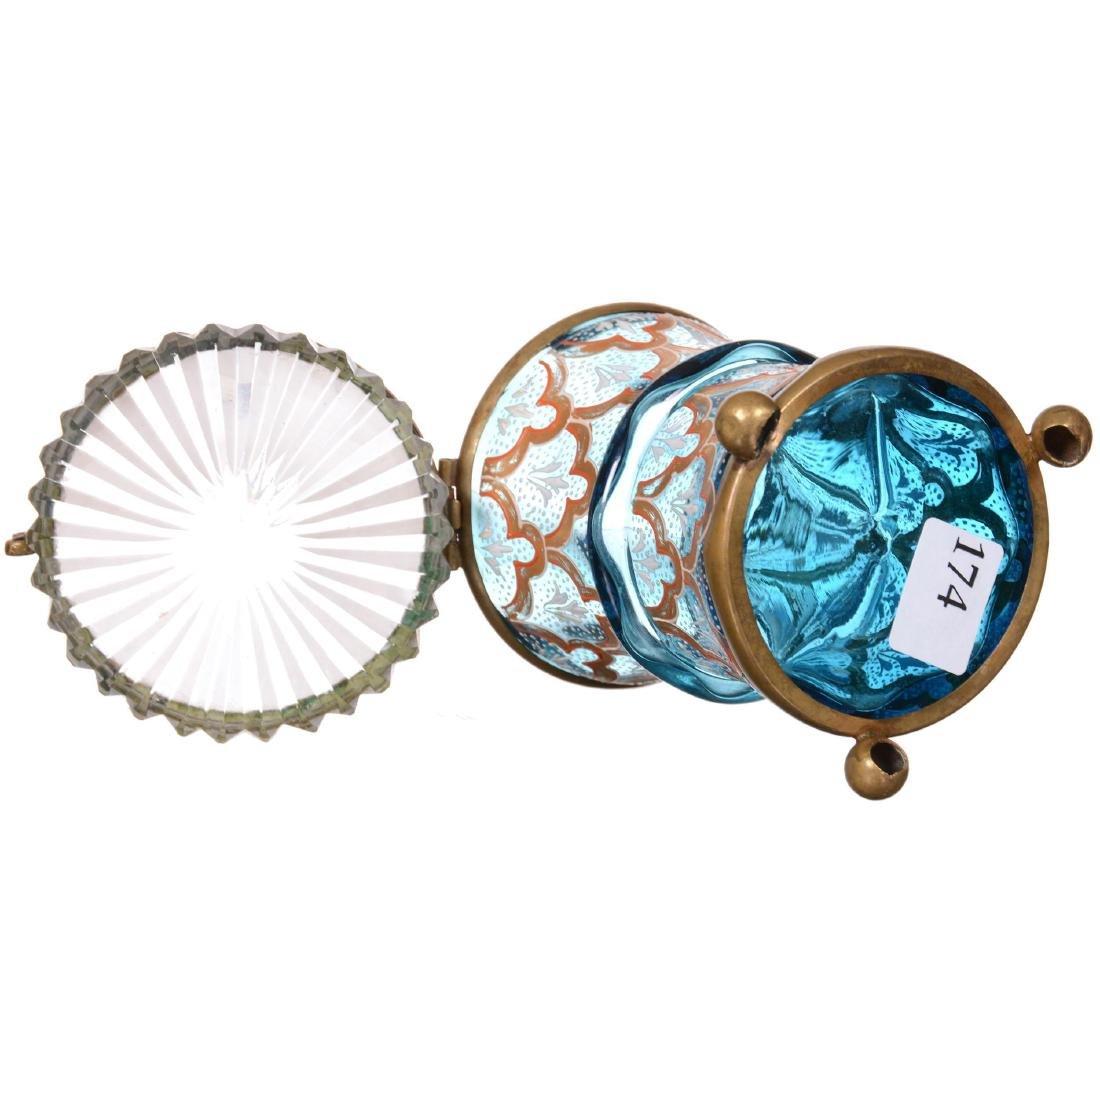 Art Glass Moser Style Jewel Box - 2